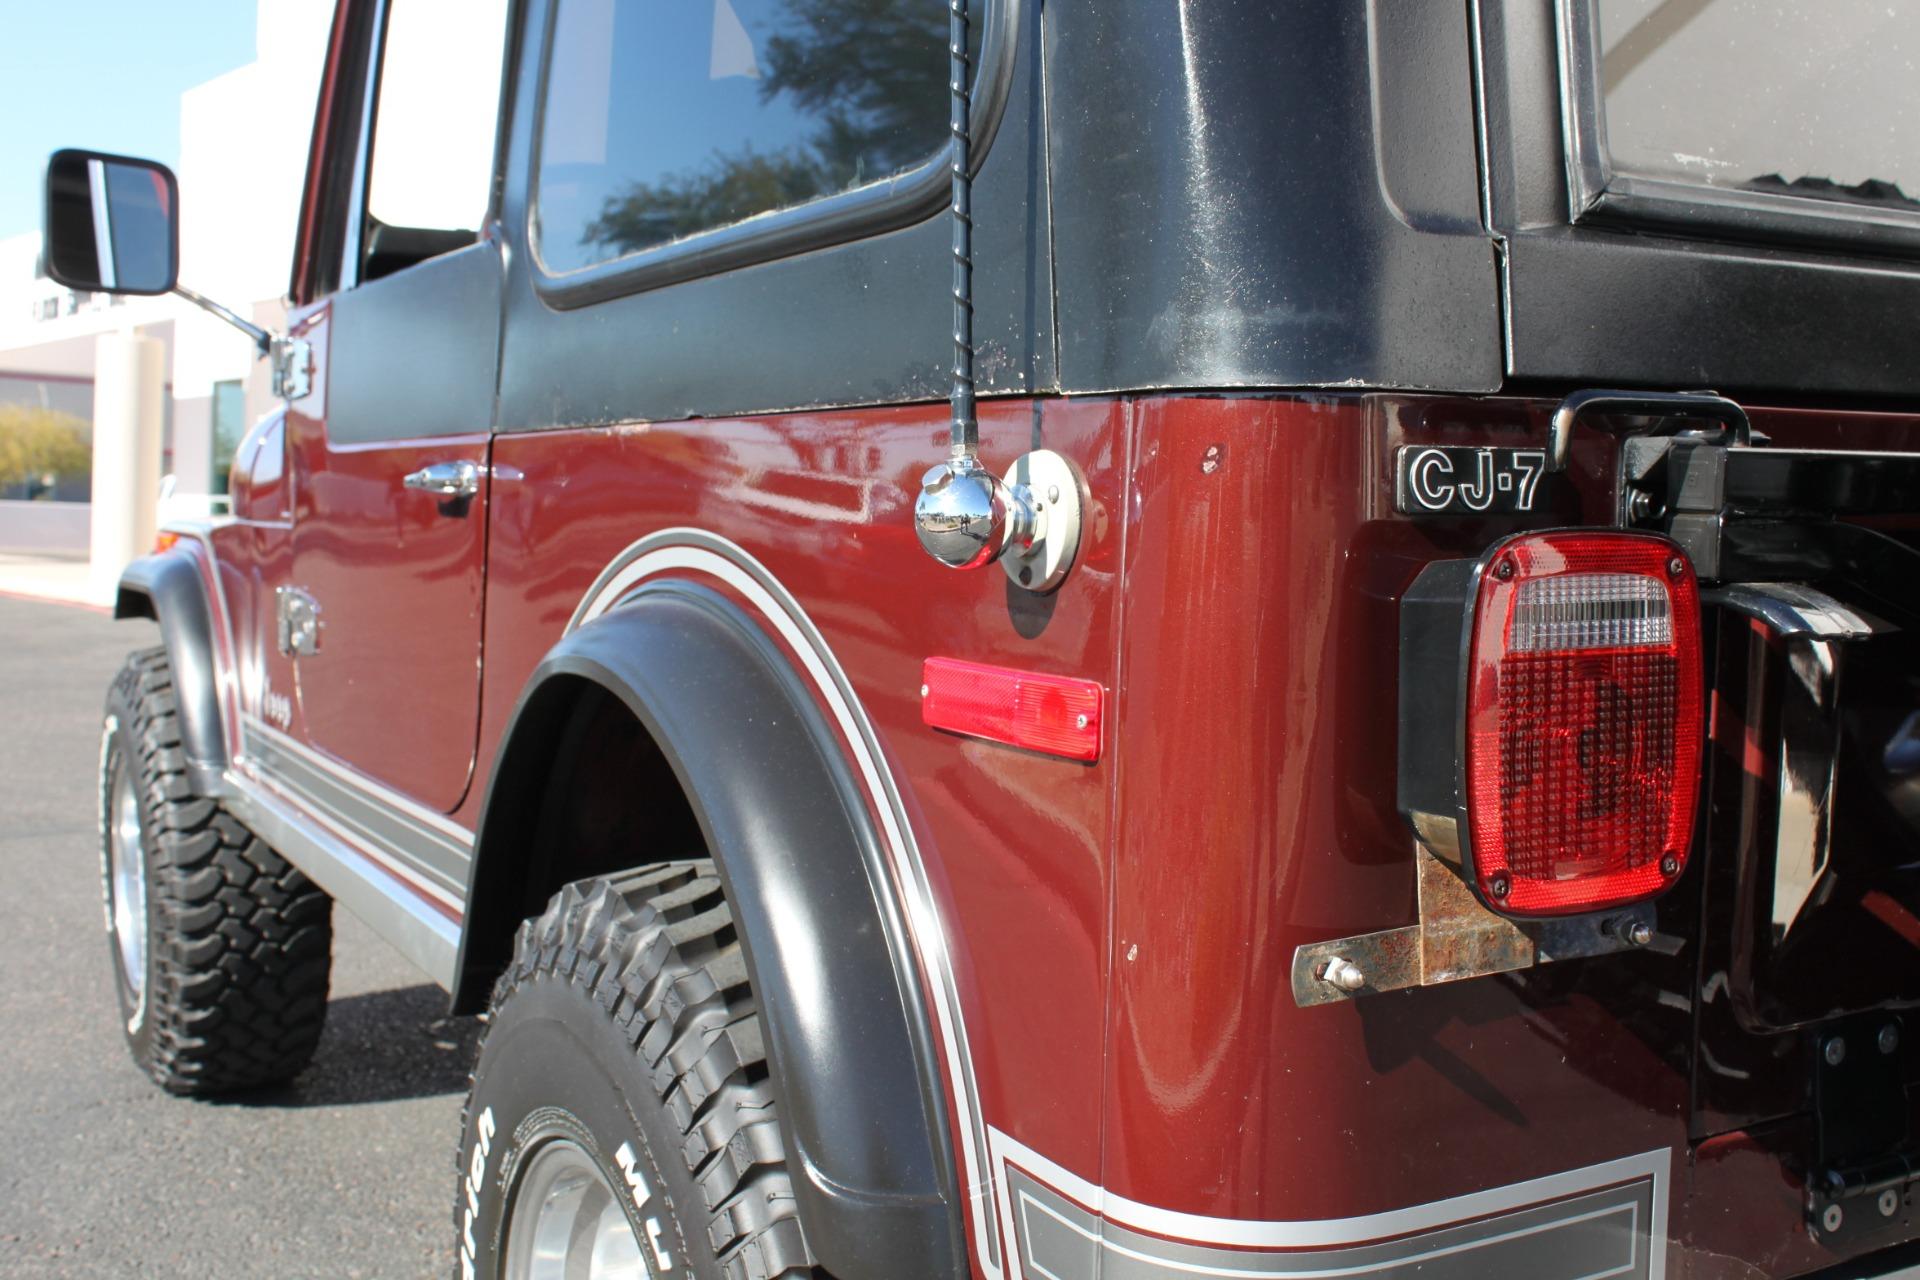 Used-1980-Jeep-CJ7-4WD-Land-Cruiser